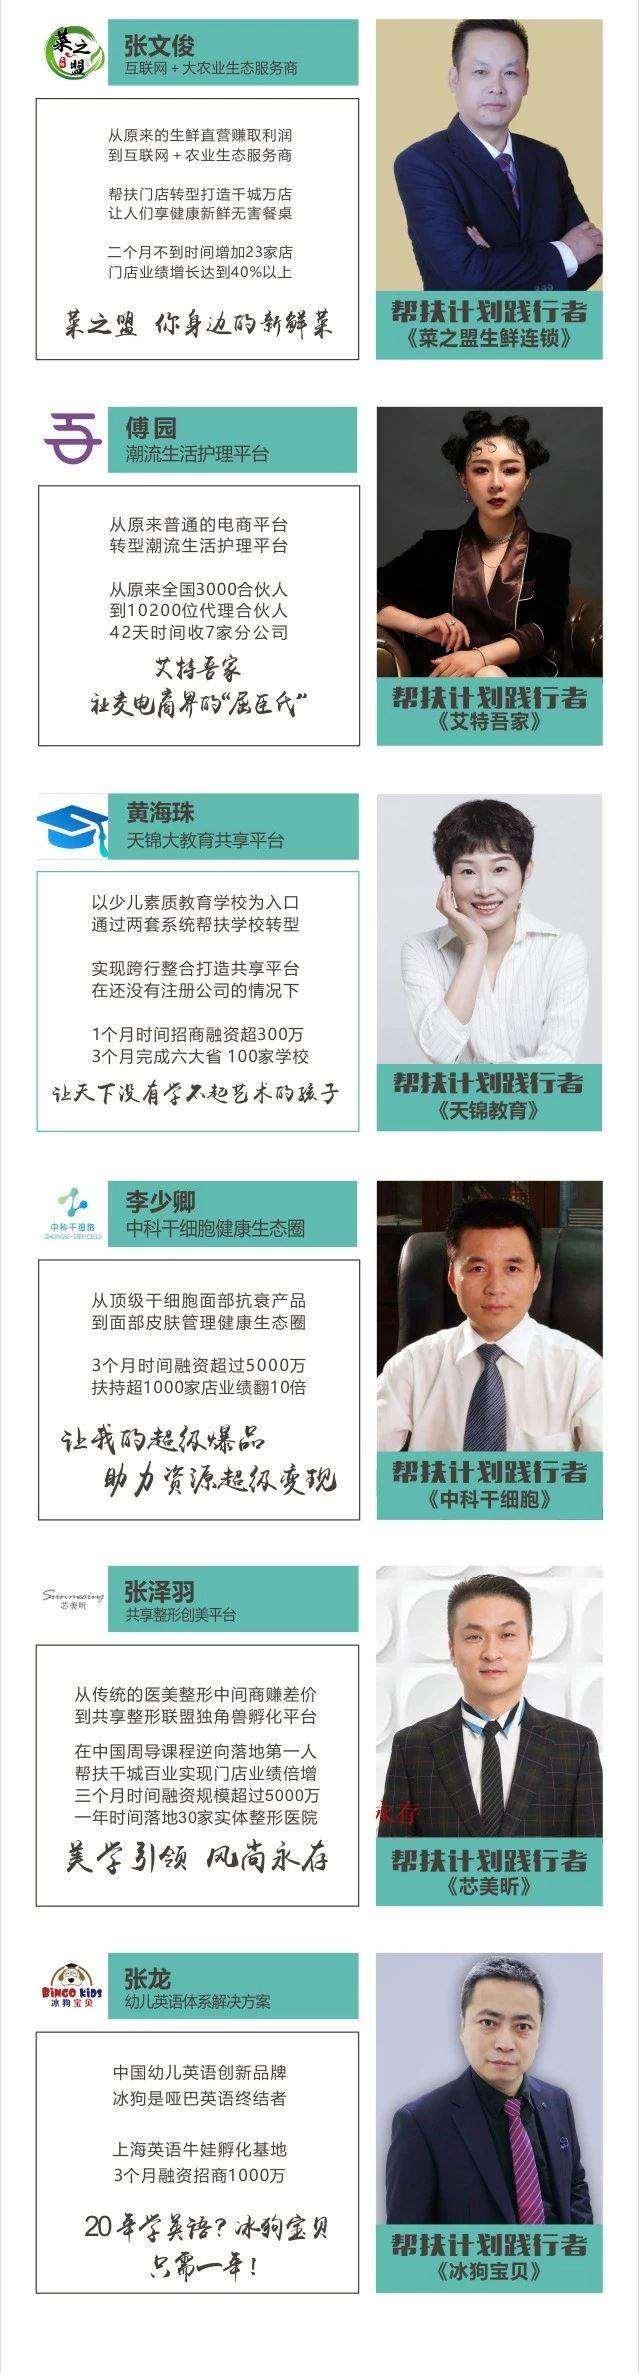 http://www.huodongxing.com/file/20191113/1063603644976/833643589803981.jpg